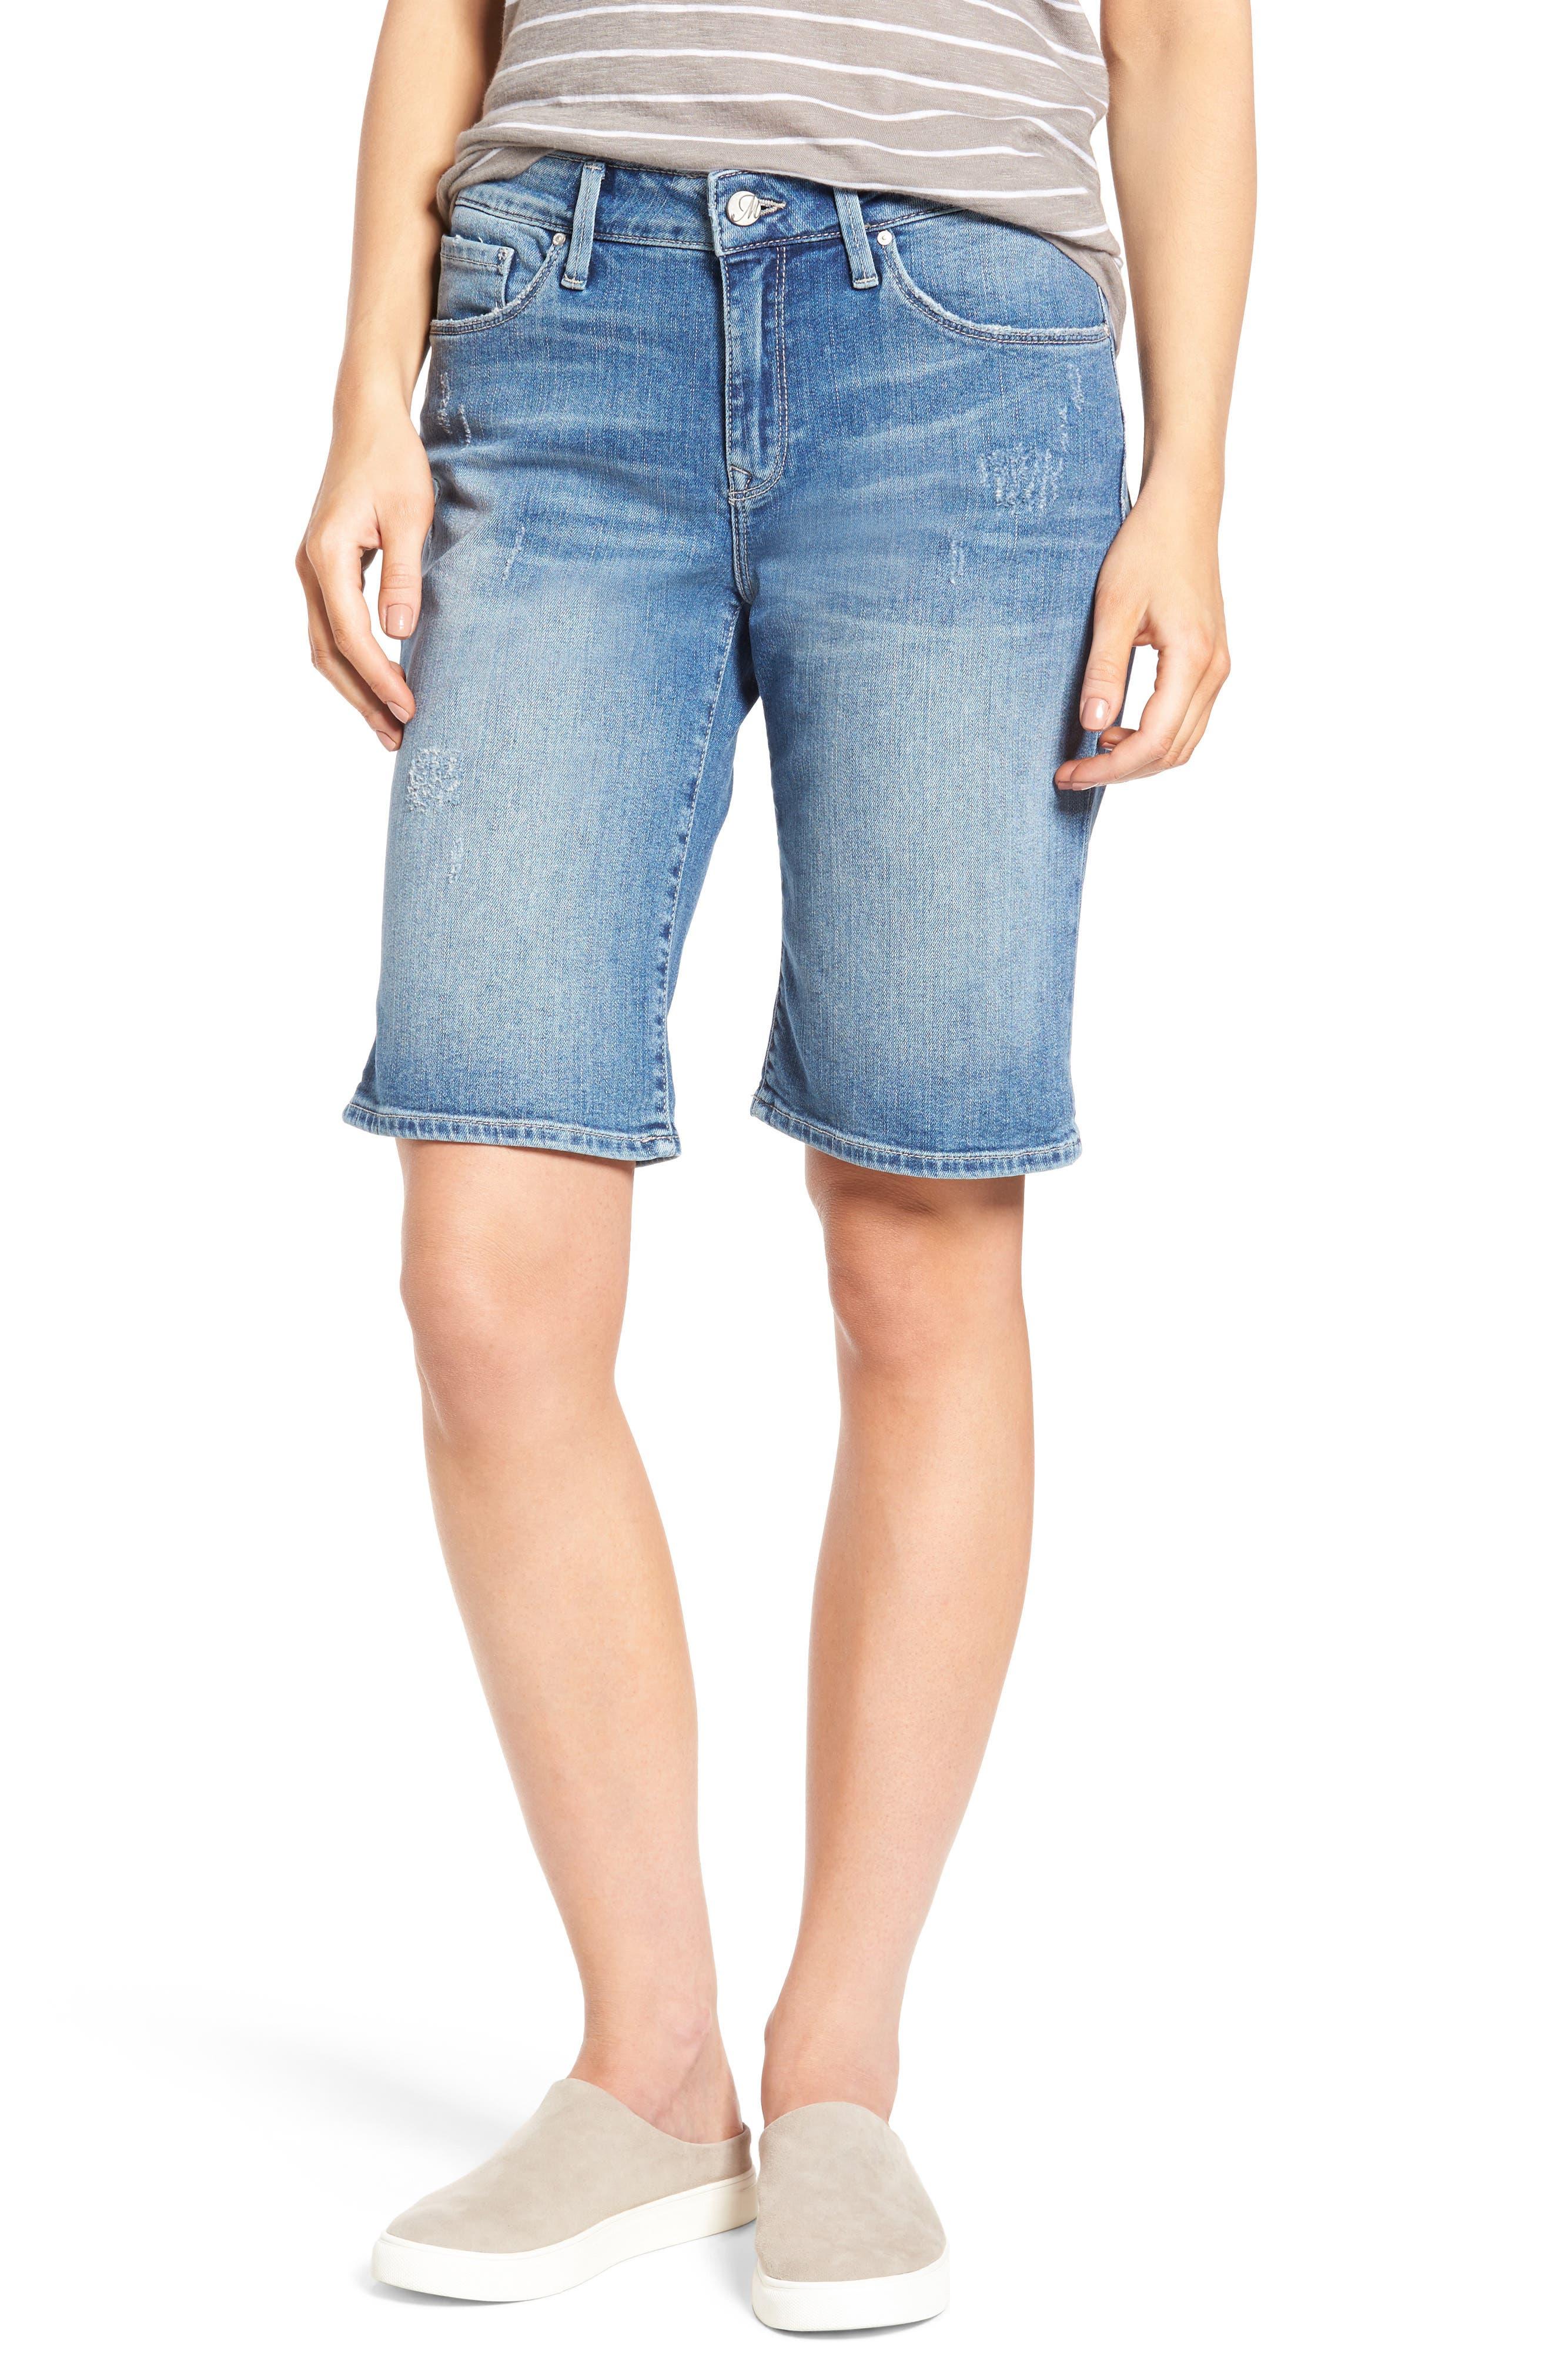 Mavi Jeans Alexis Ripped Denim Shorts